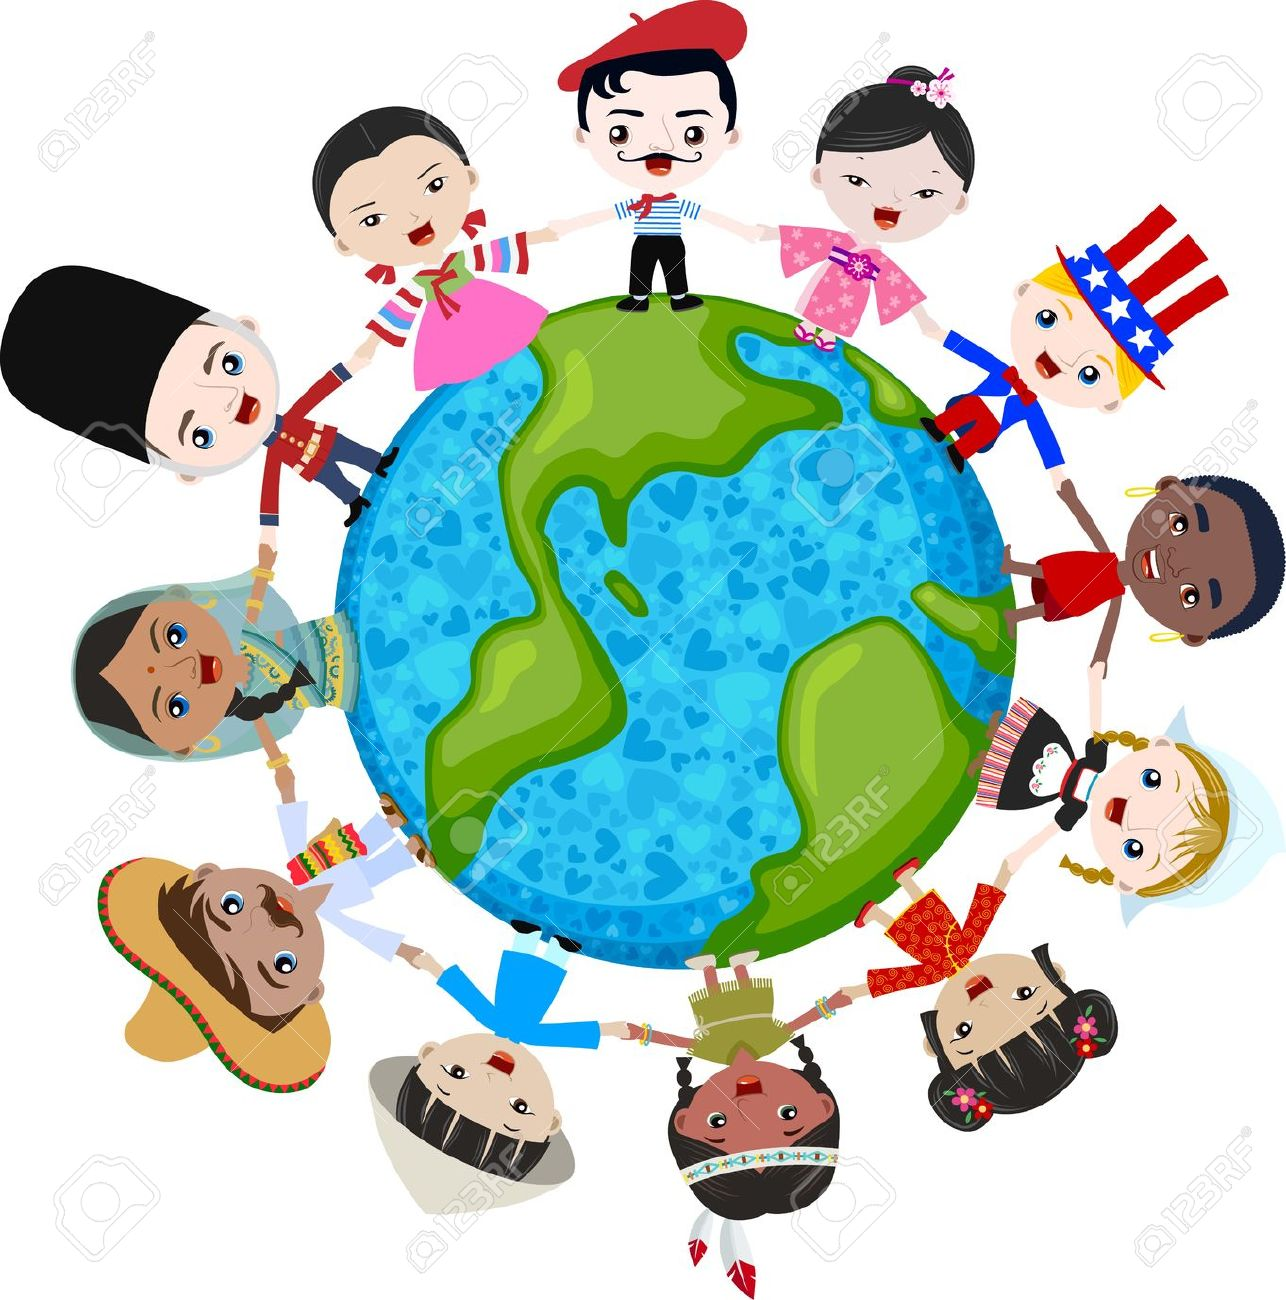 Culture clipart safe world, Culture safe world Transparent.